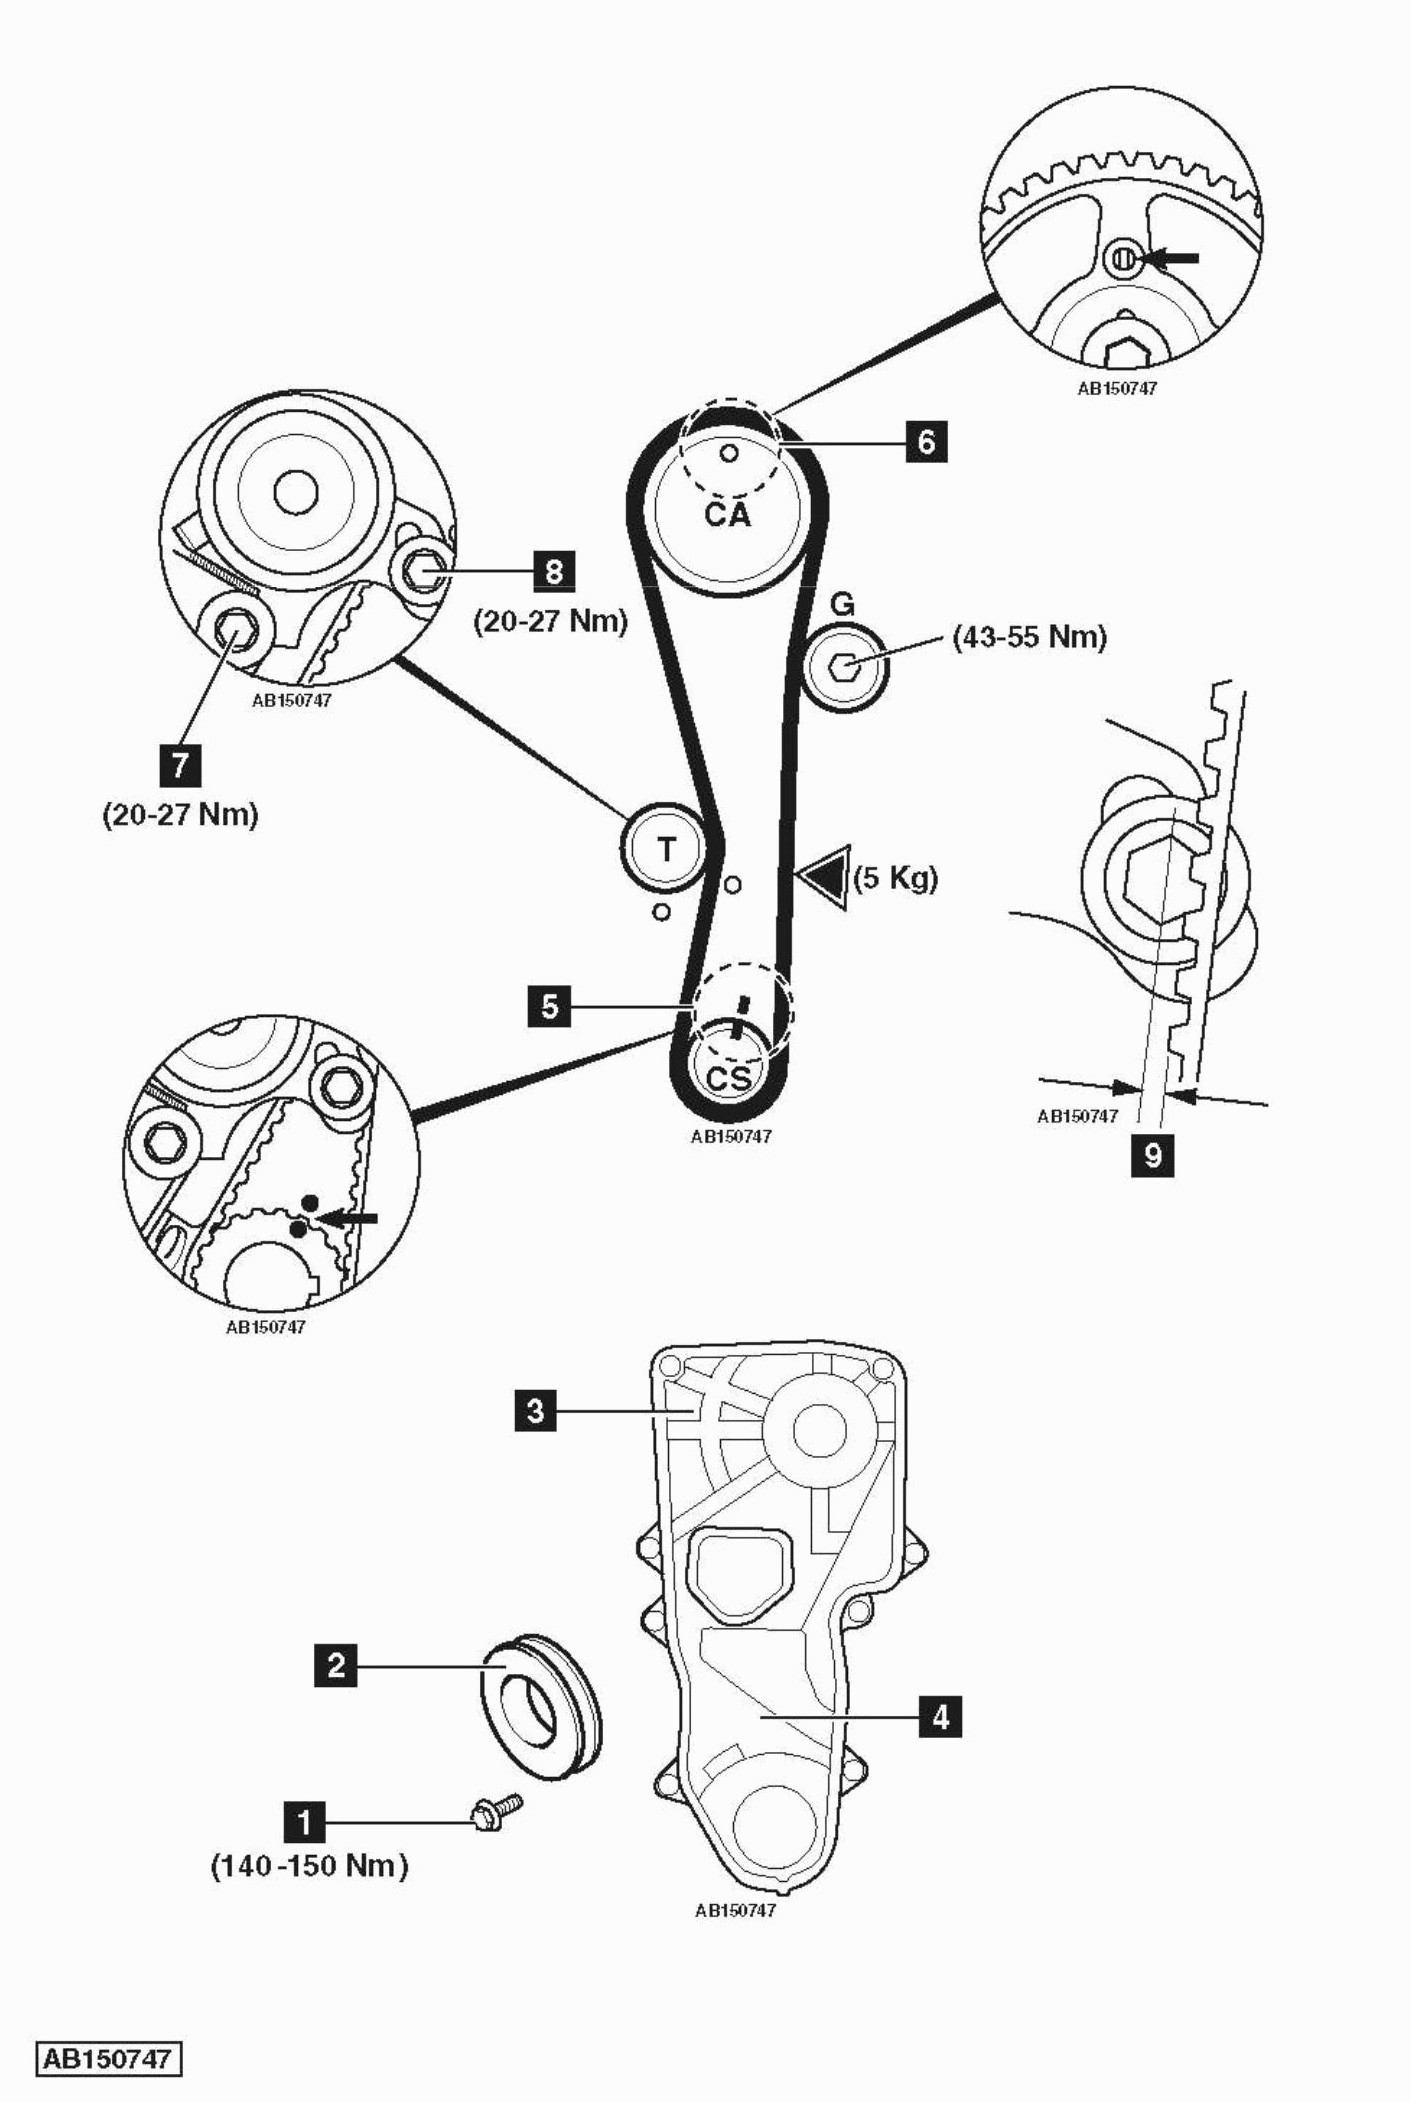 2003 Hyundai Santa Fe Engine Diagram 48 Better Hyundai Santa Fe Timing Belt Graphy Of 2003 Hyundai Santa Fe Engine Diagram